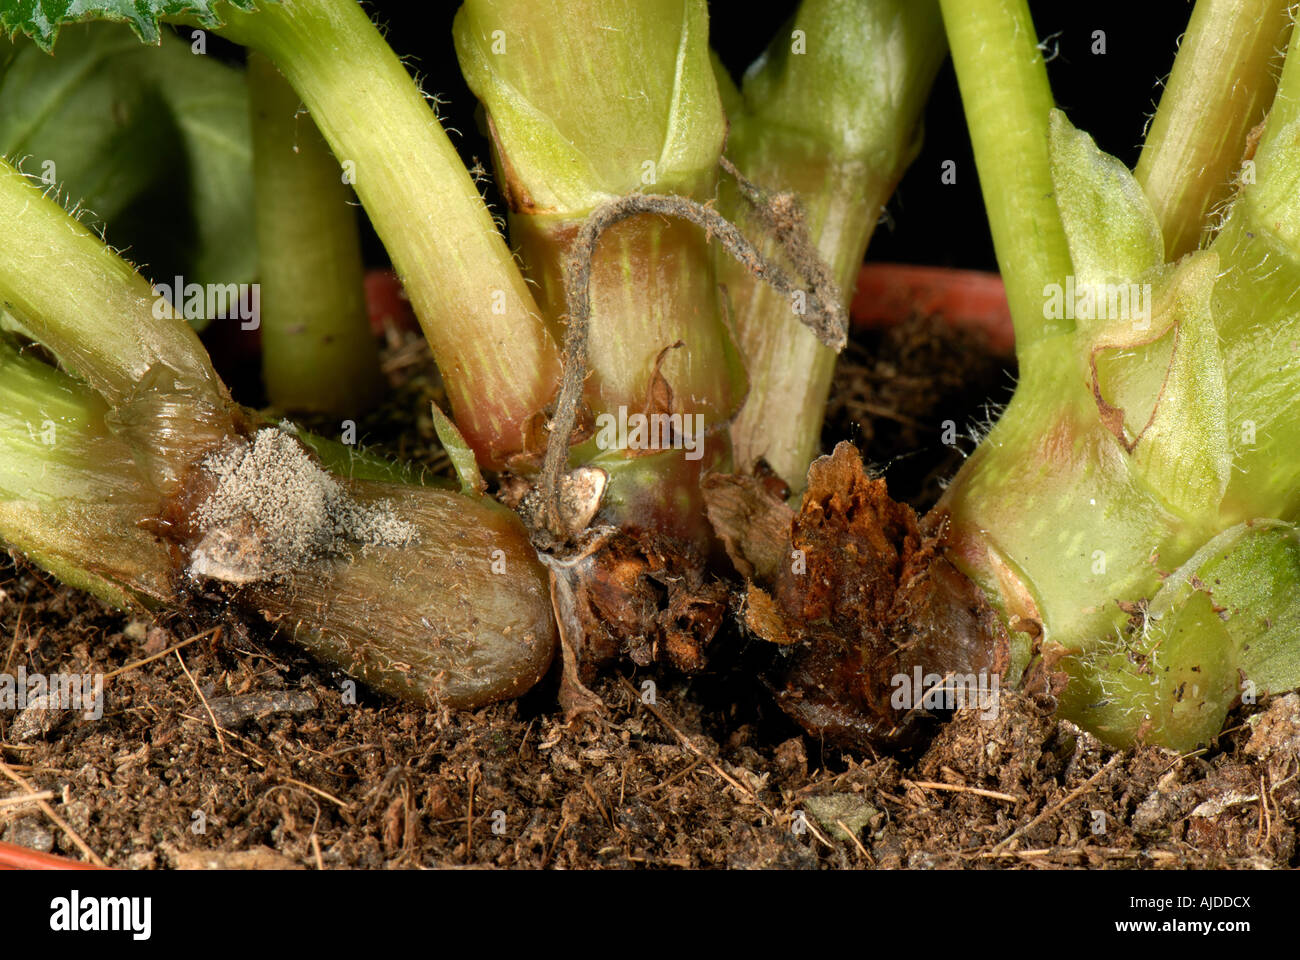 Botrytis grey mould stockfotos botrytis grey mould bilder alamy - Begonie zimmerpflanze ...